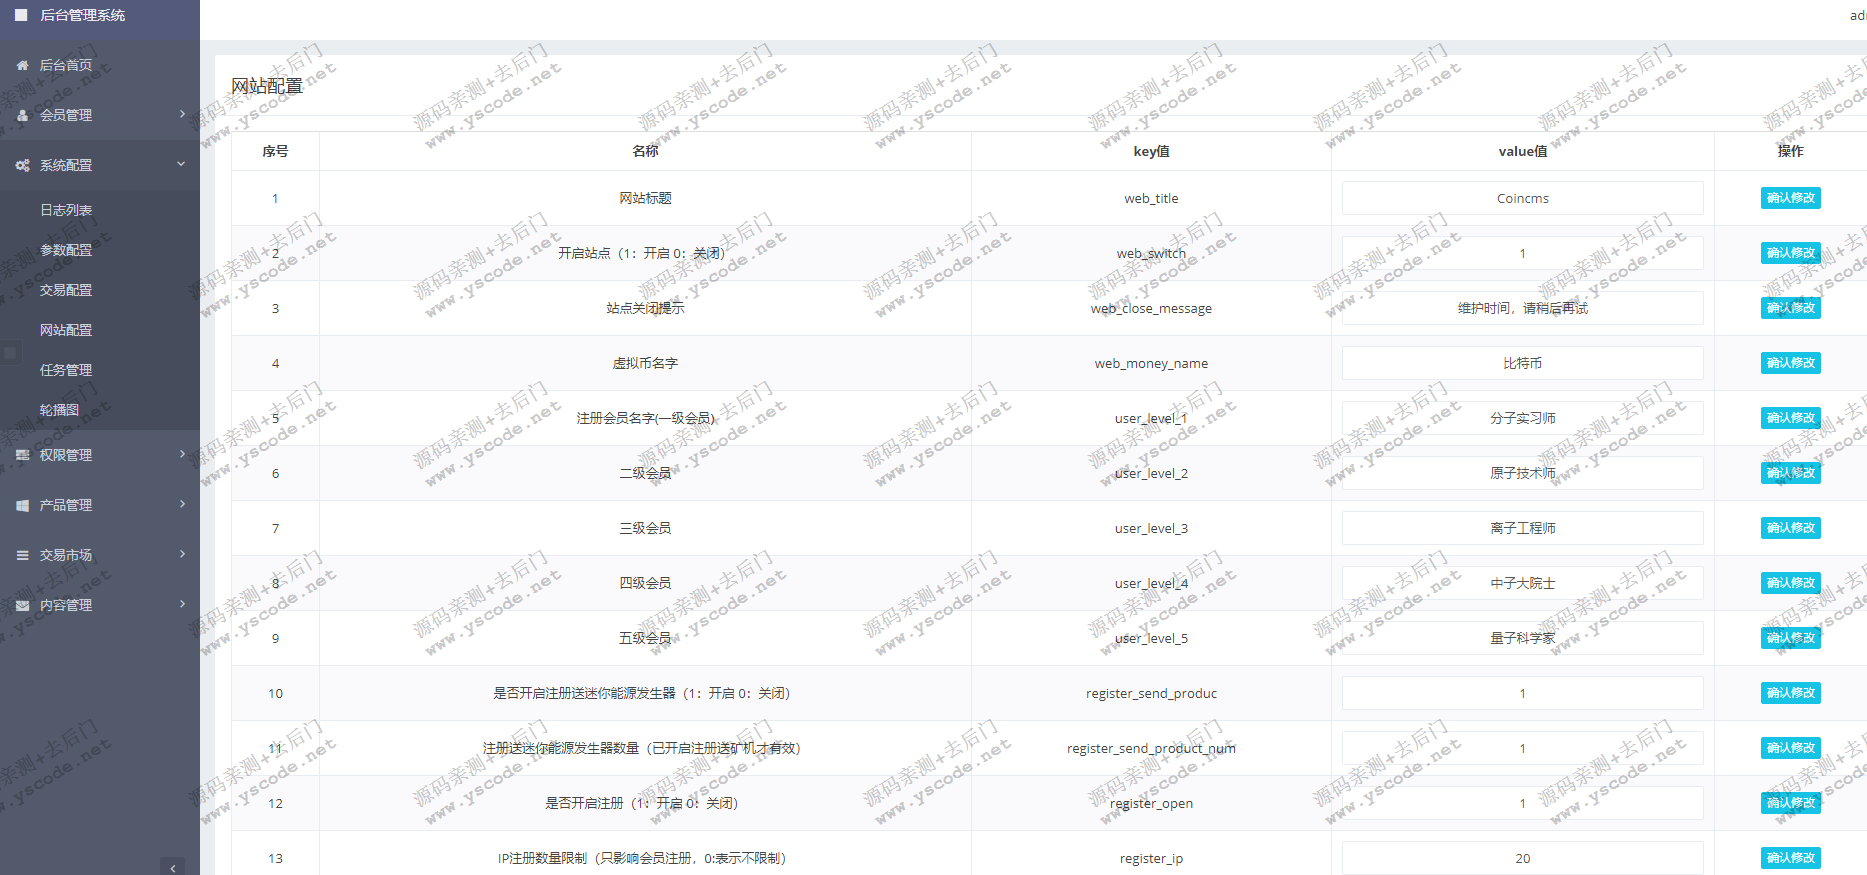 Thinkphp5区块链+挖矿,数字资产,运营级矿机市场完整开源(已测试)插图5